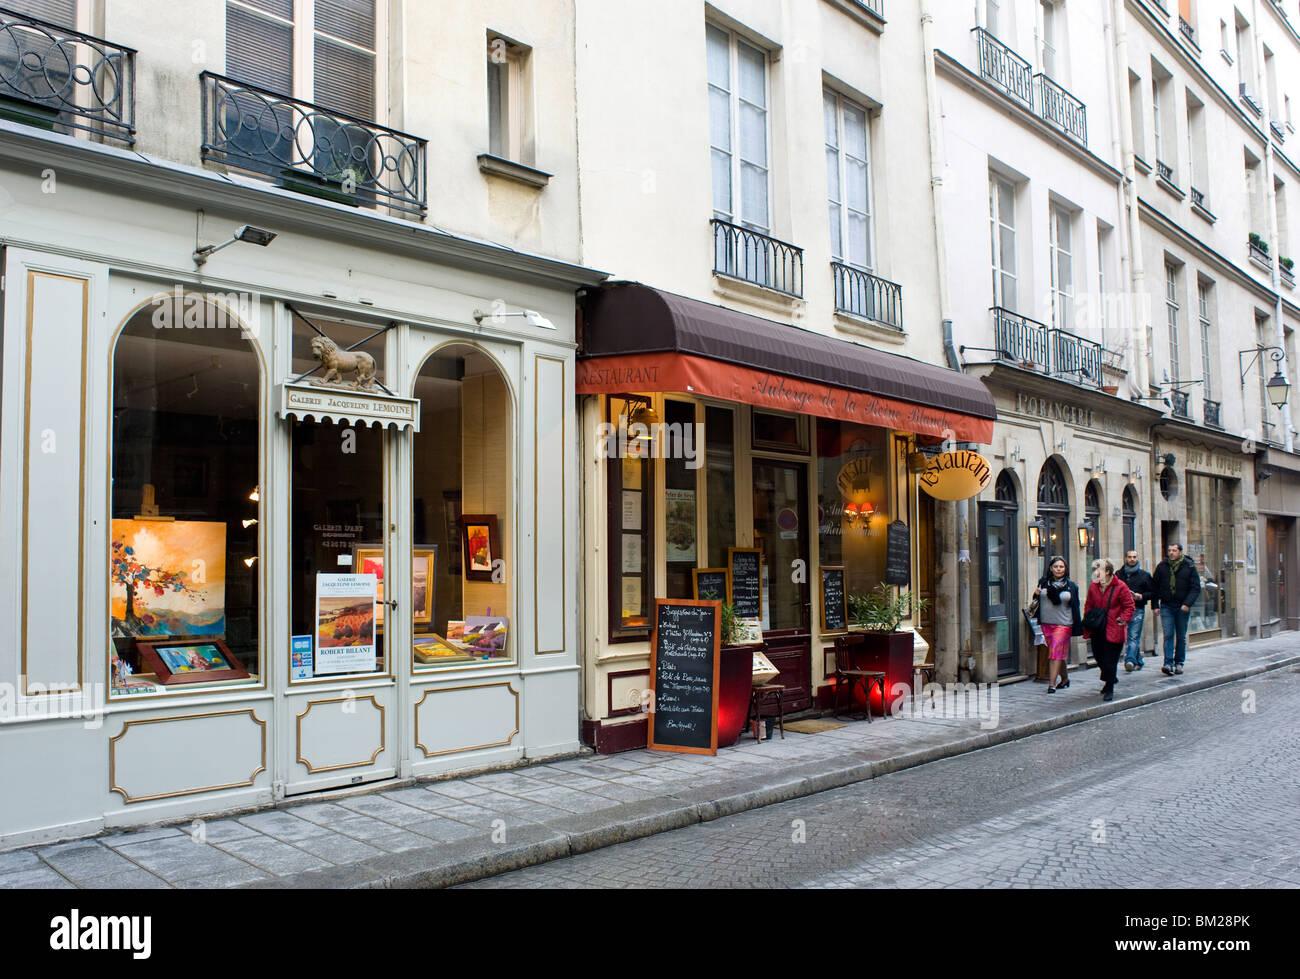 Shops and restaurants on the Ile St. Louis, Paris, France - Stock Image